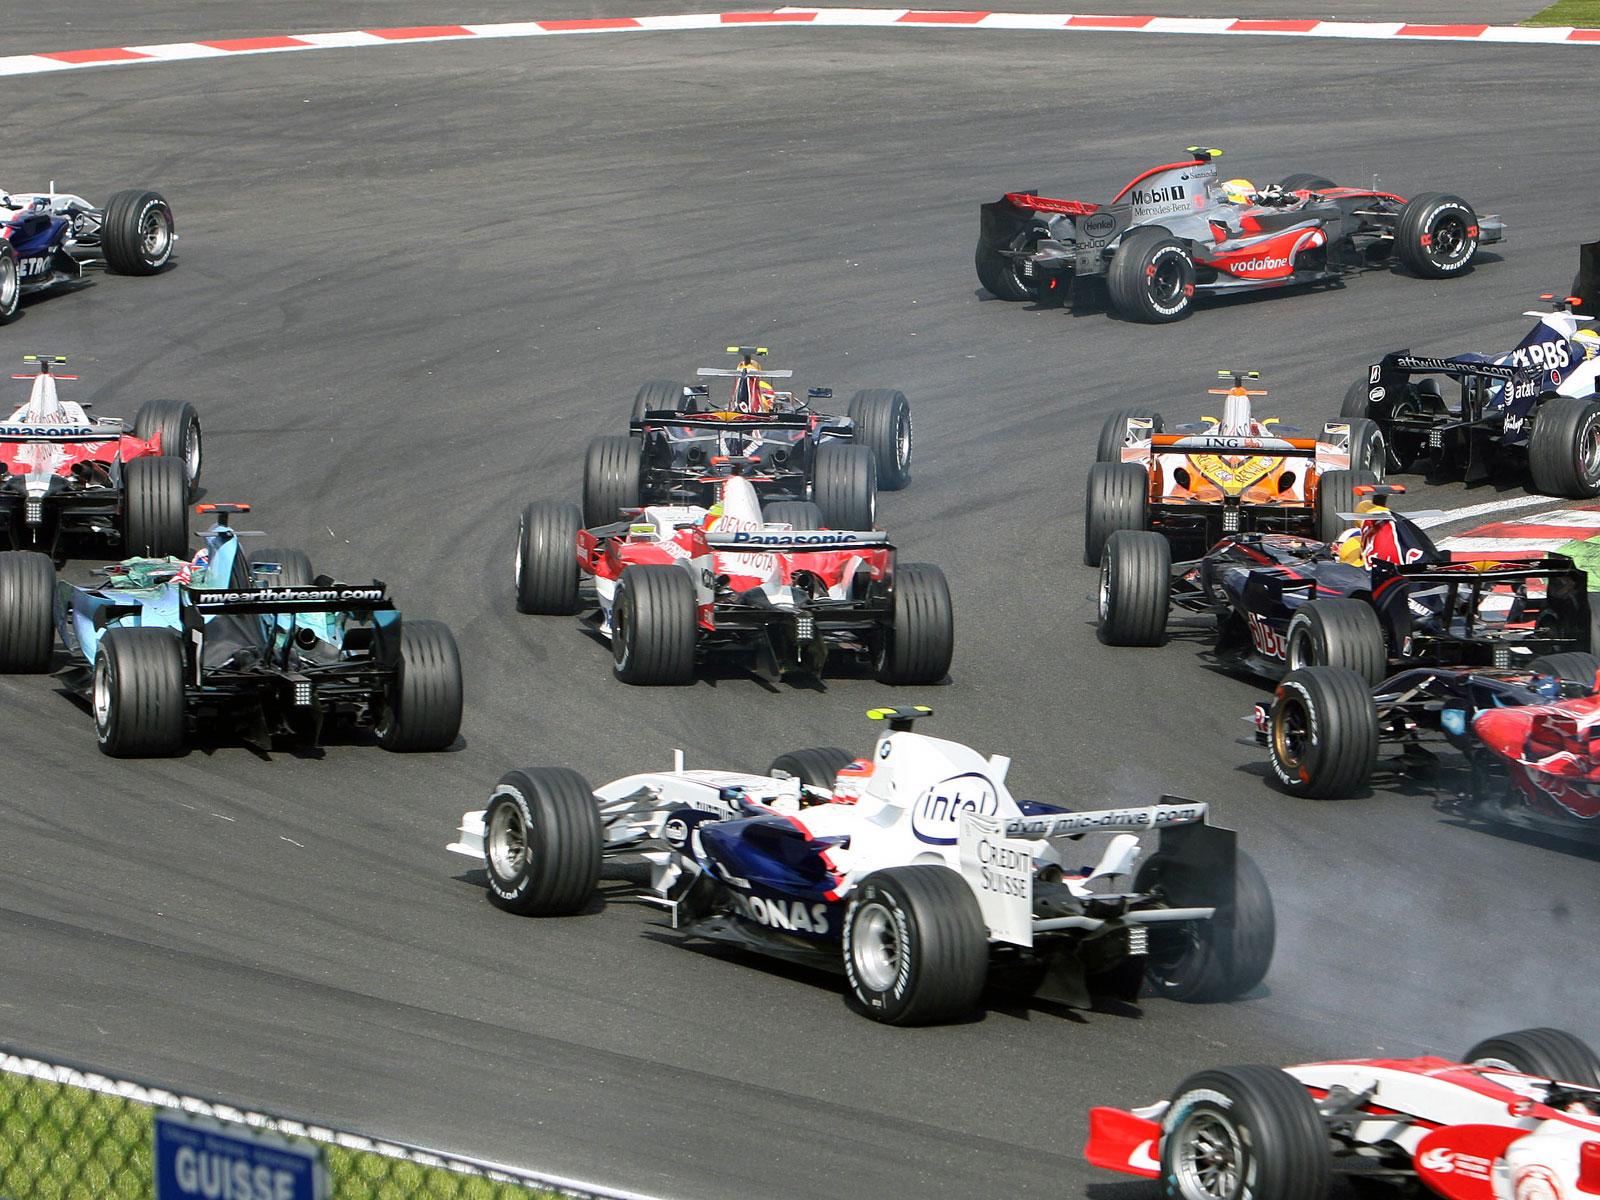 HD Wallpapers 2007 Formula 1 Grand Prix of Belgium   F1-Fansite.com